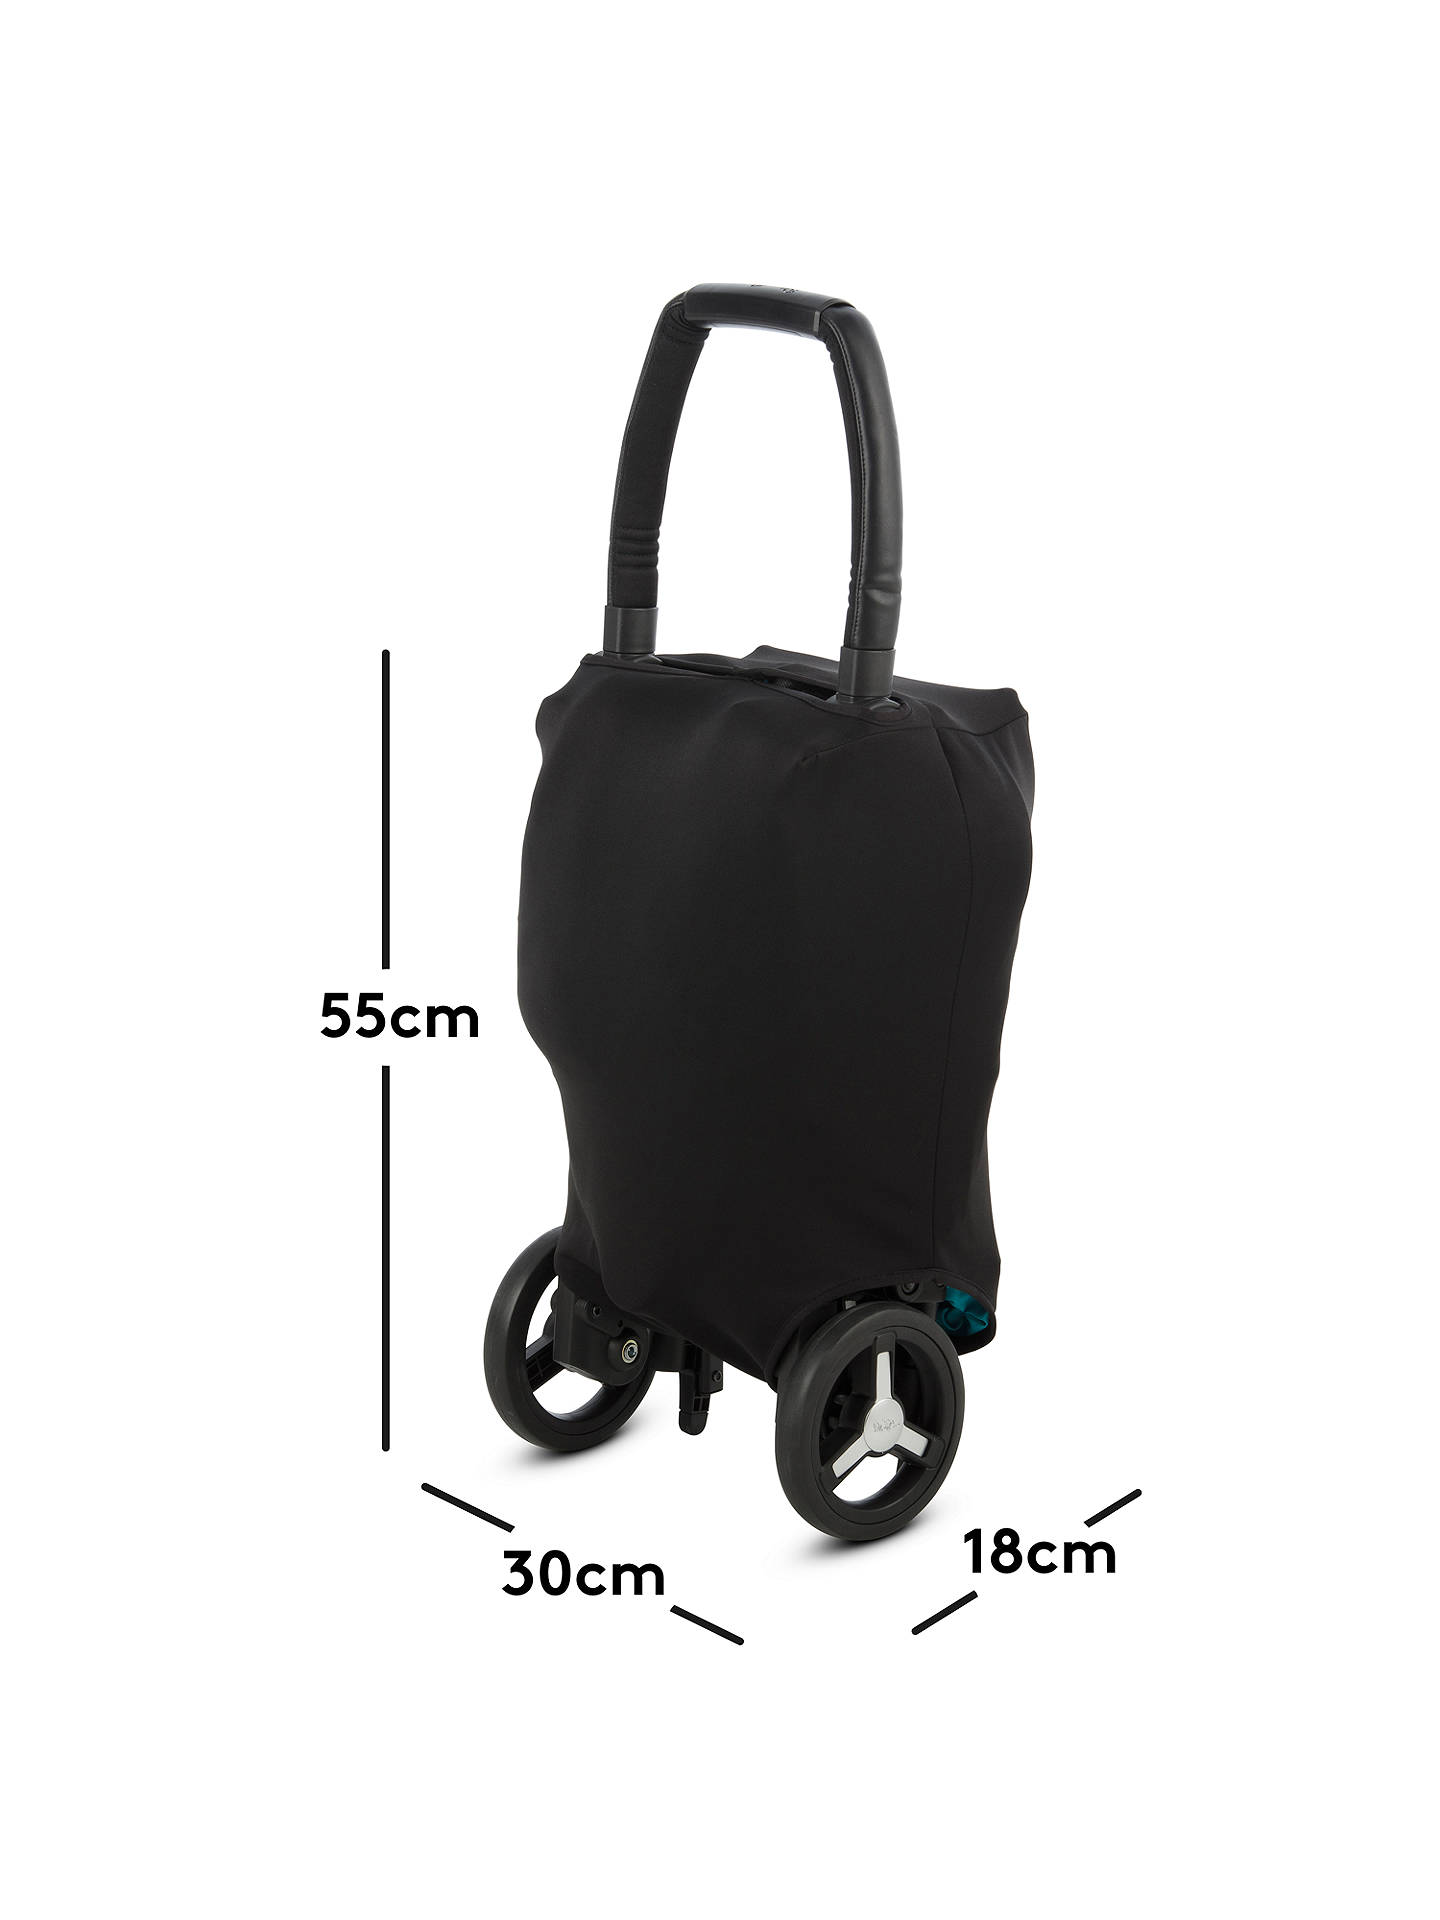 Handmade strap handle seat belt cover luggage bag suitcase pram cover star wars